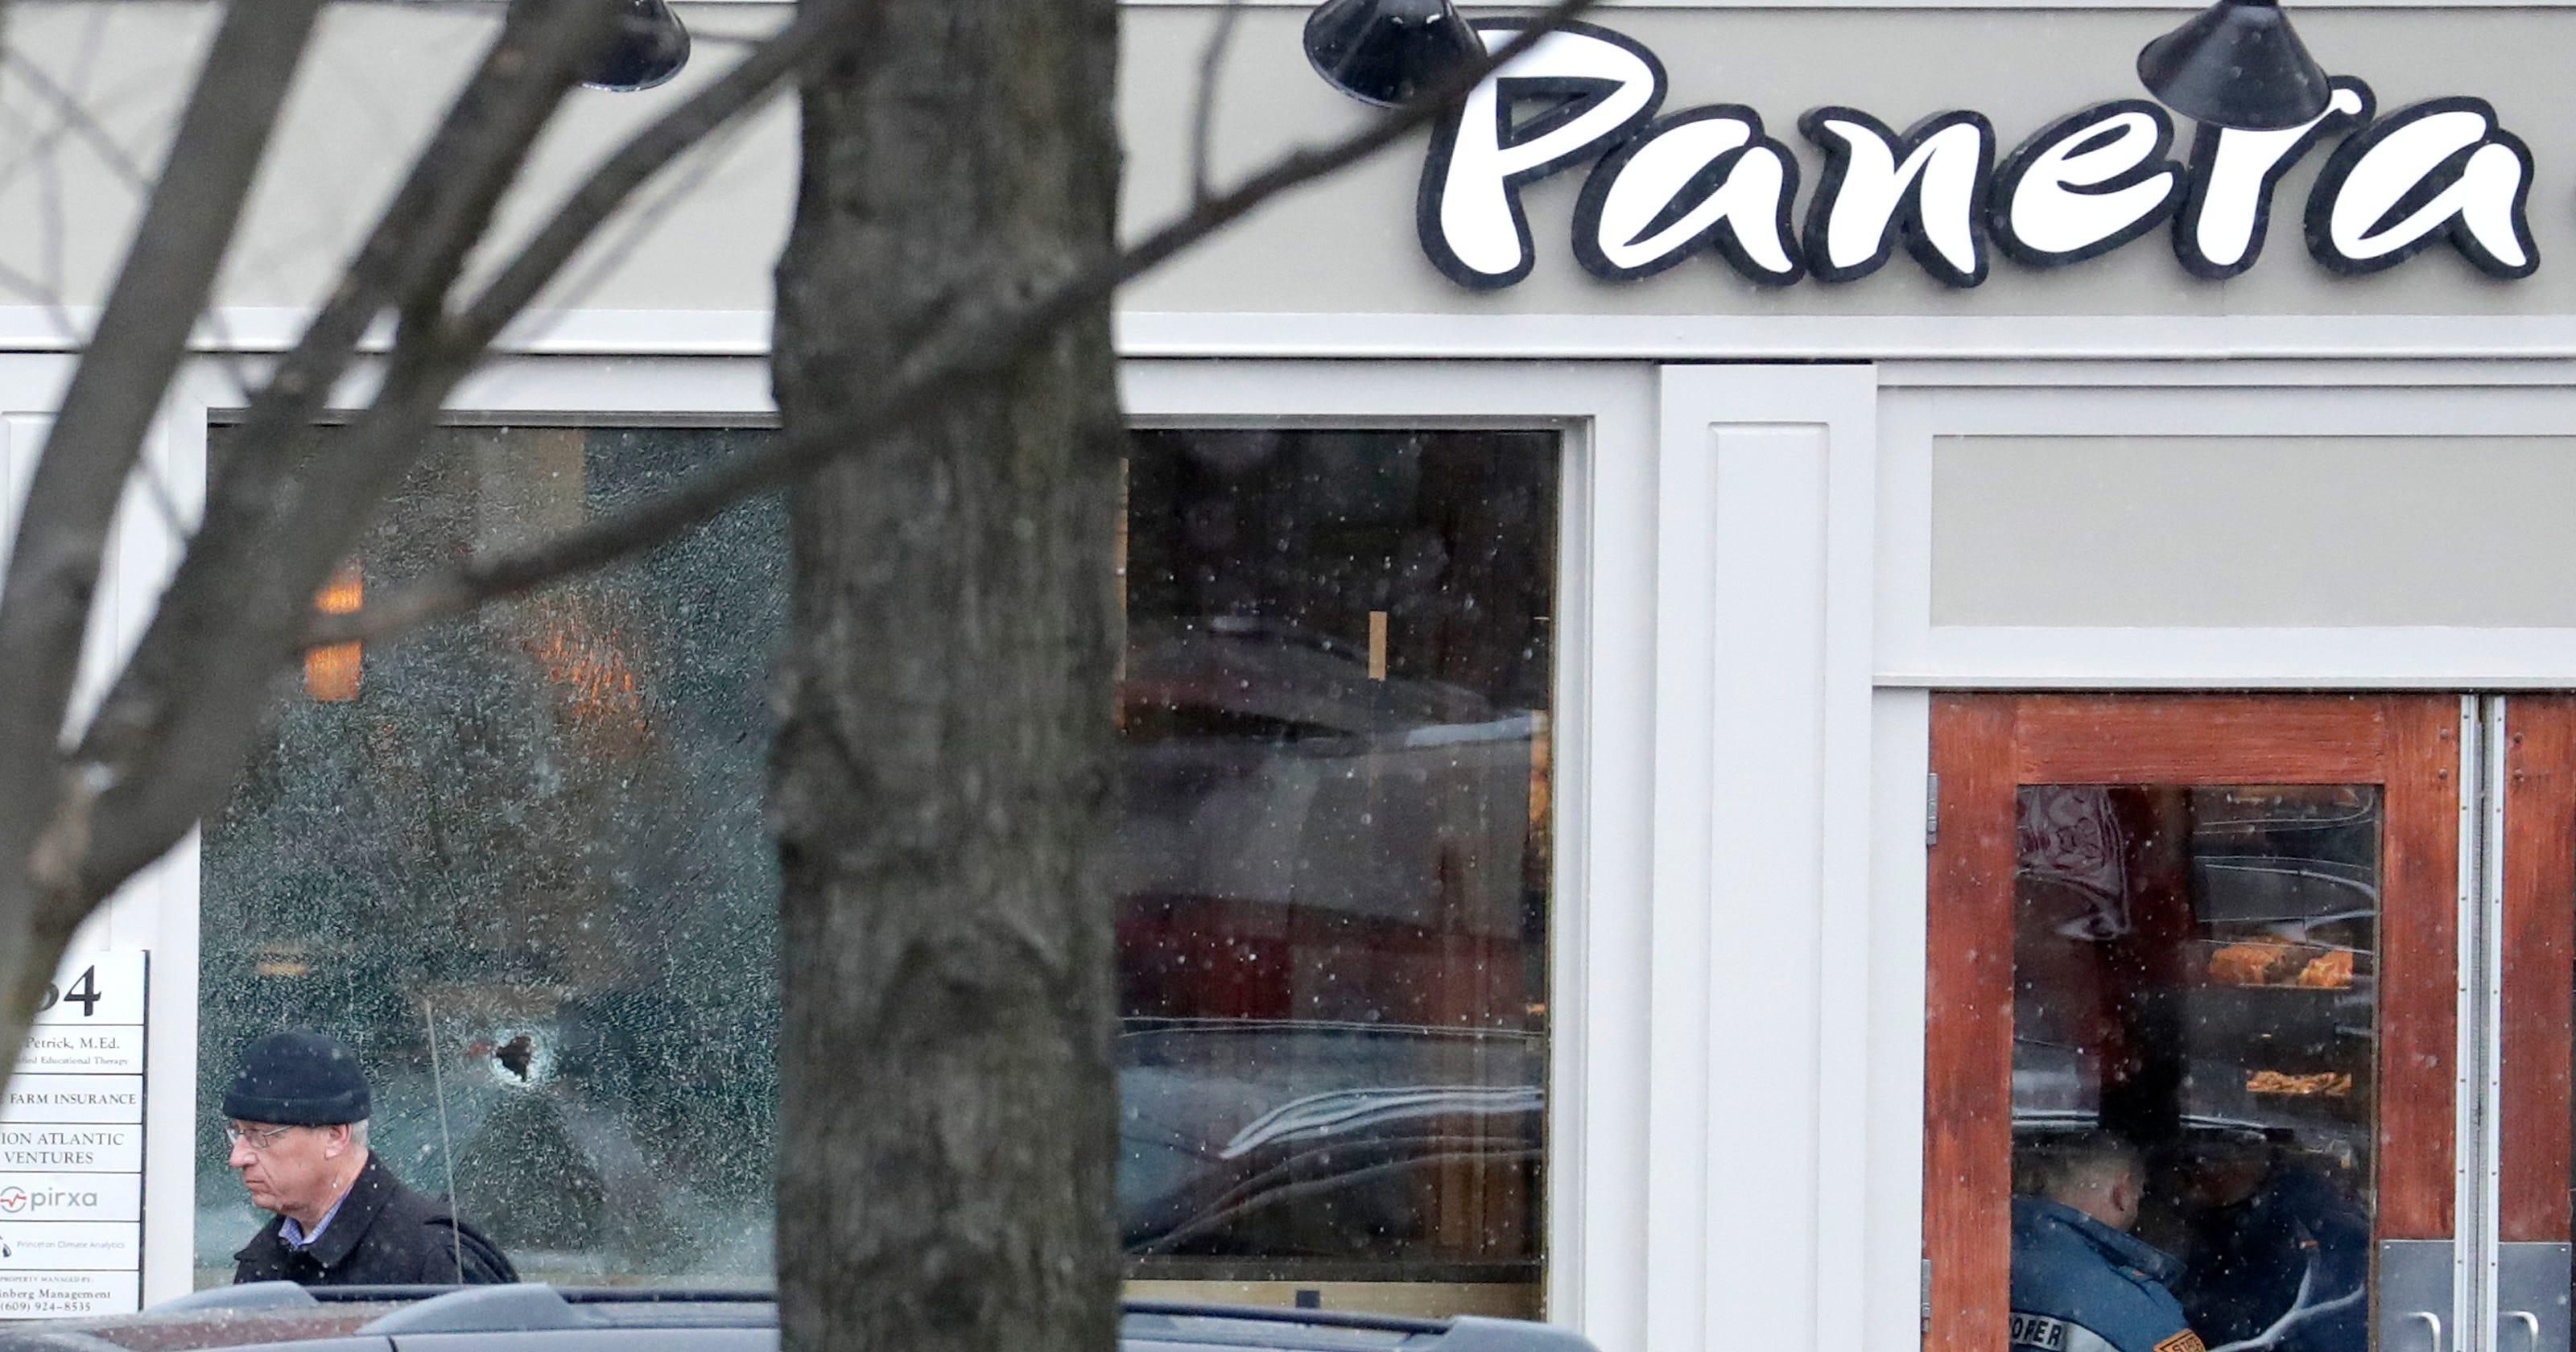 Princeton Panera fatal police-involved shooting video released